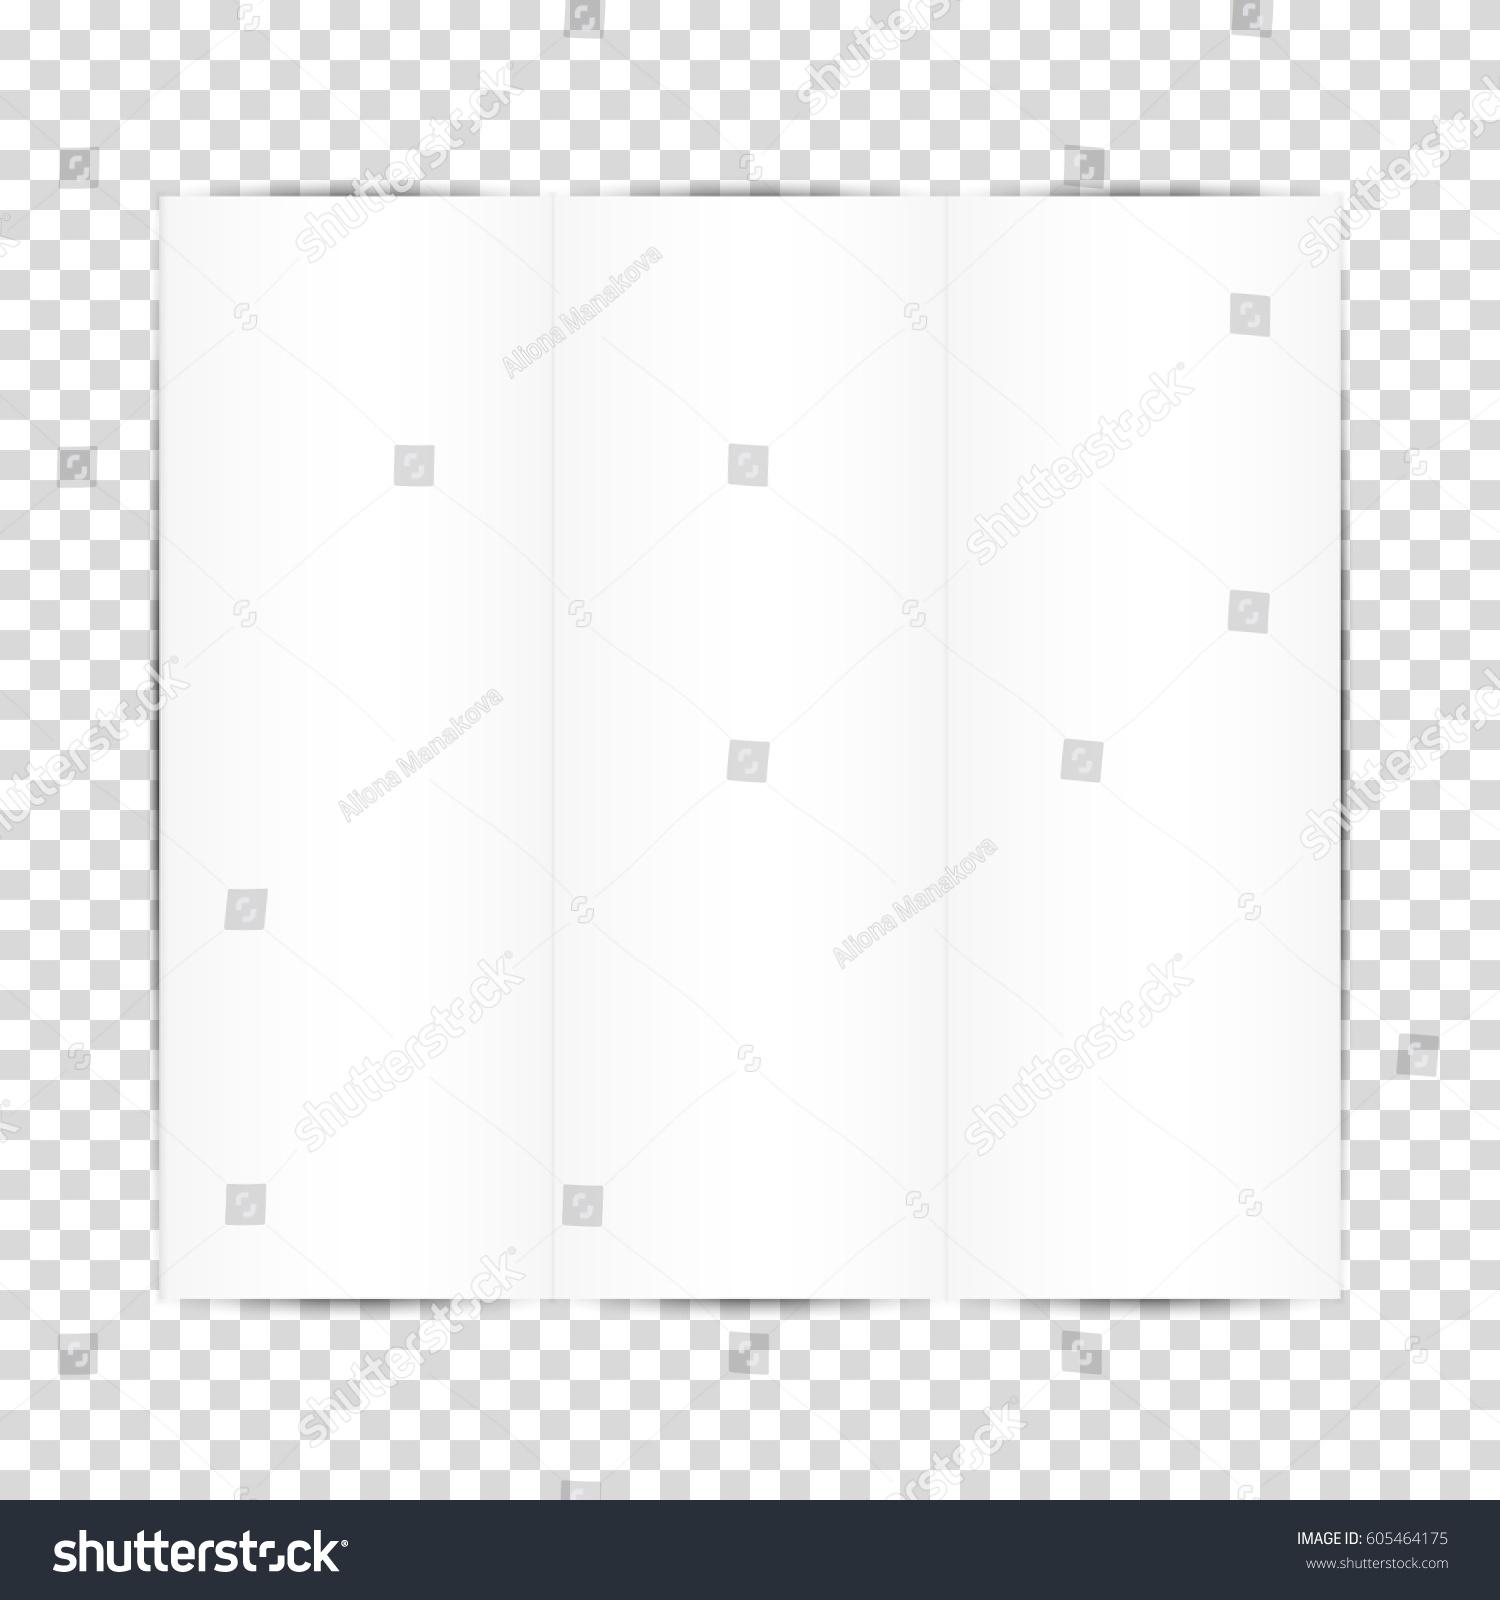 Blank White Paper Sheets Vector Illustration Stock Vector ...